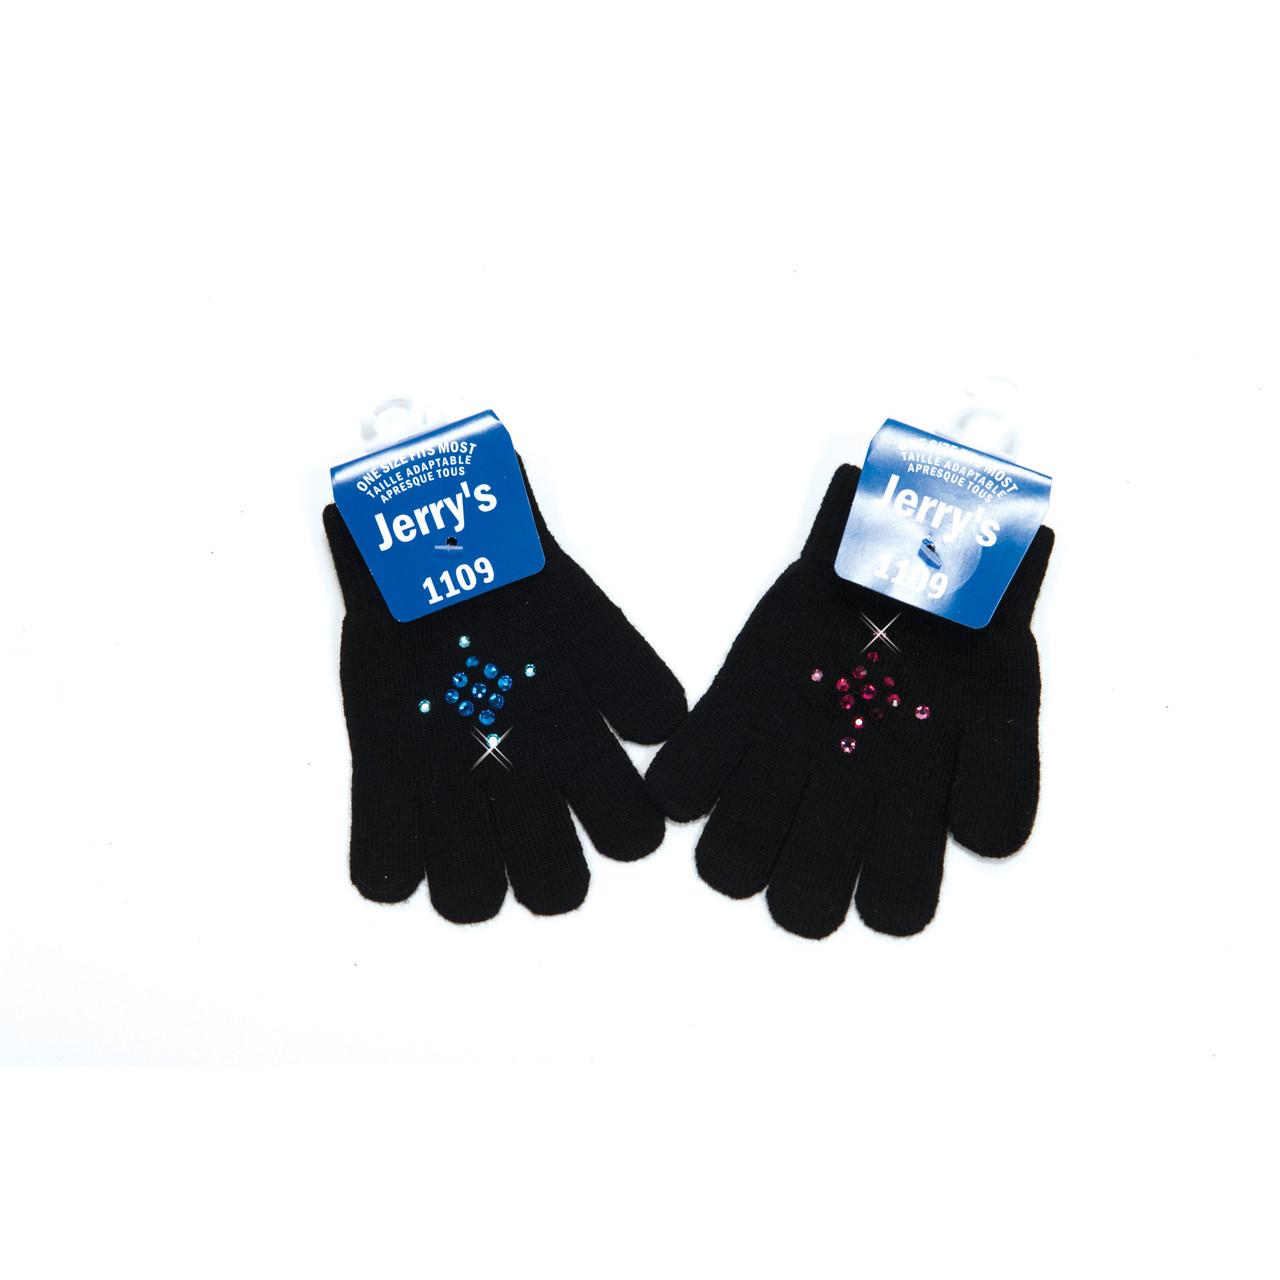 New Figure Skating 1111 Gripper Mini Gloves Black